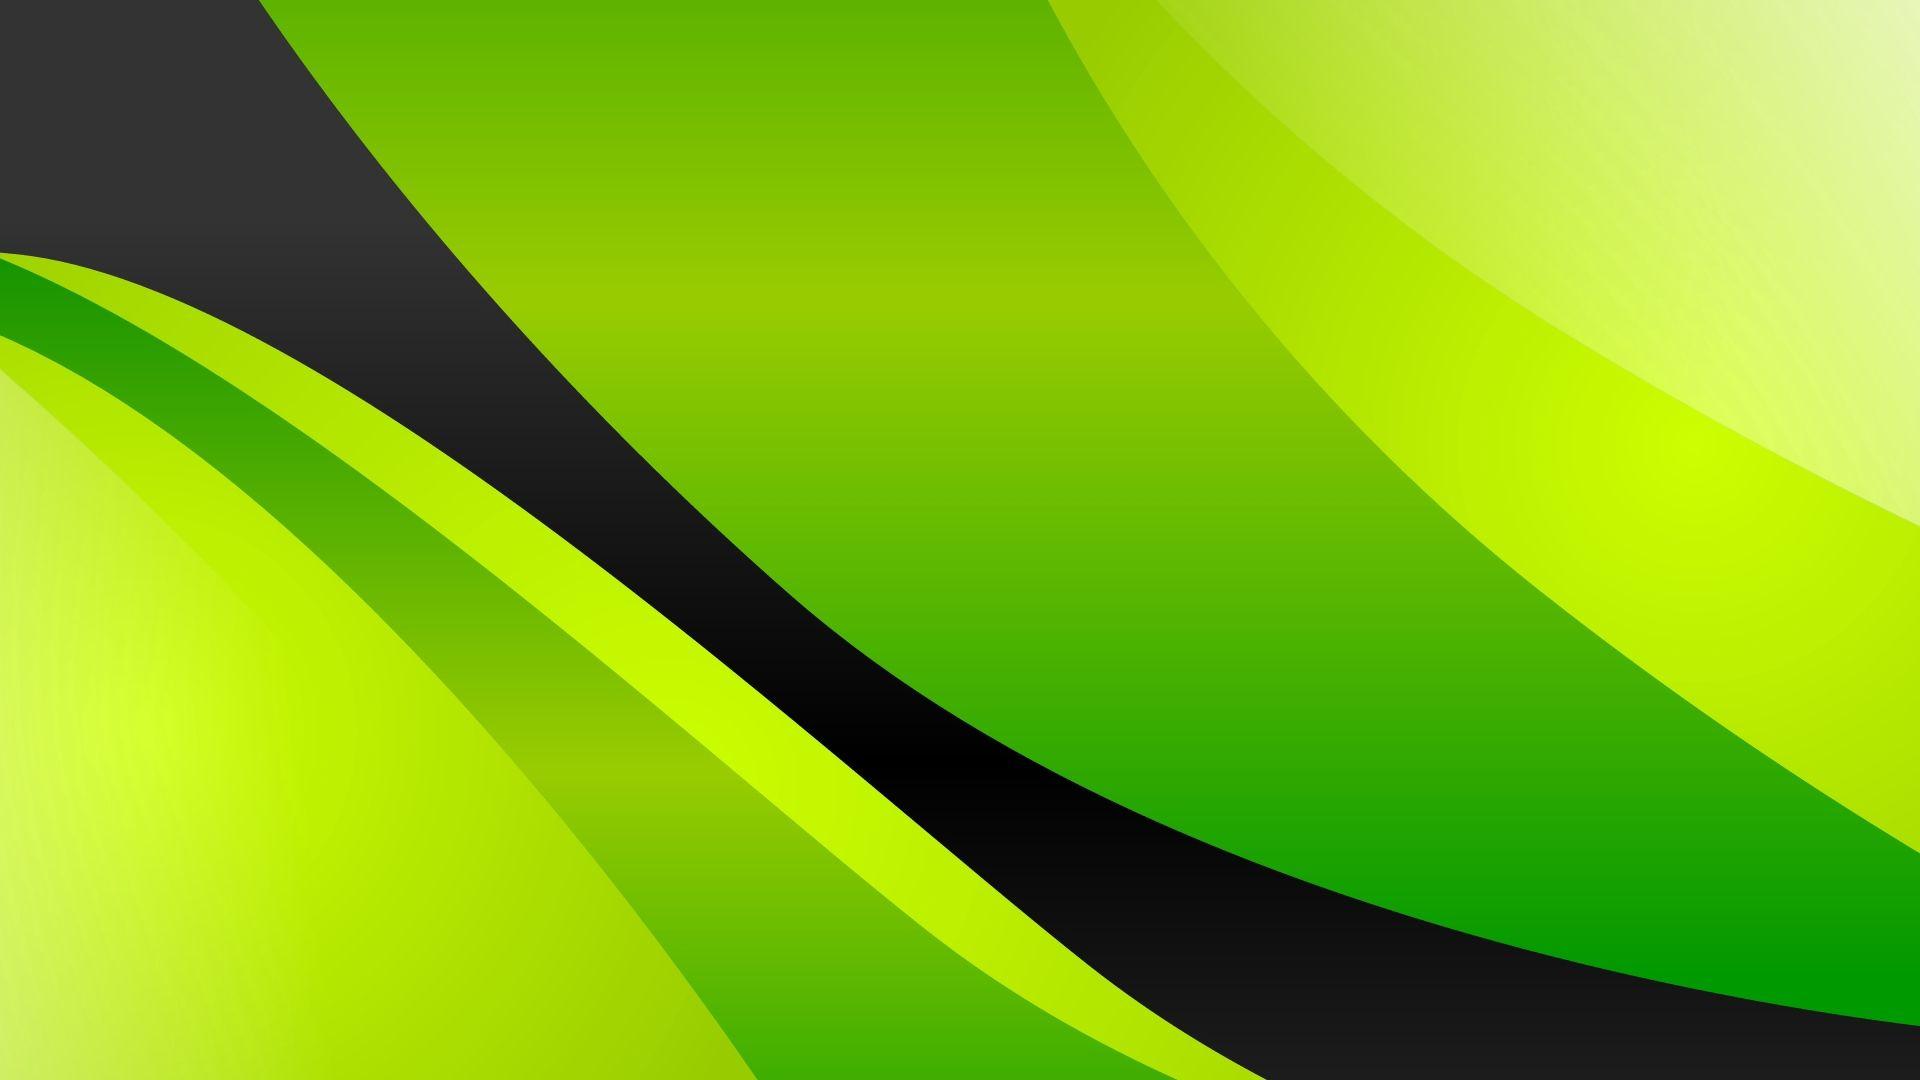 Green And Purple desktop wallpaper download